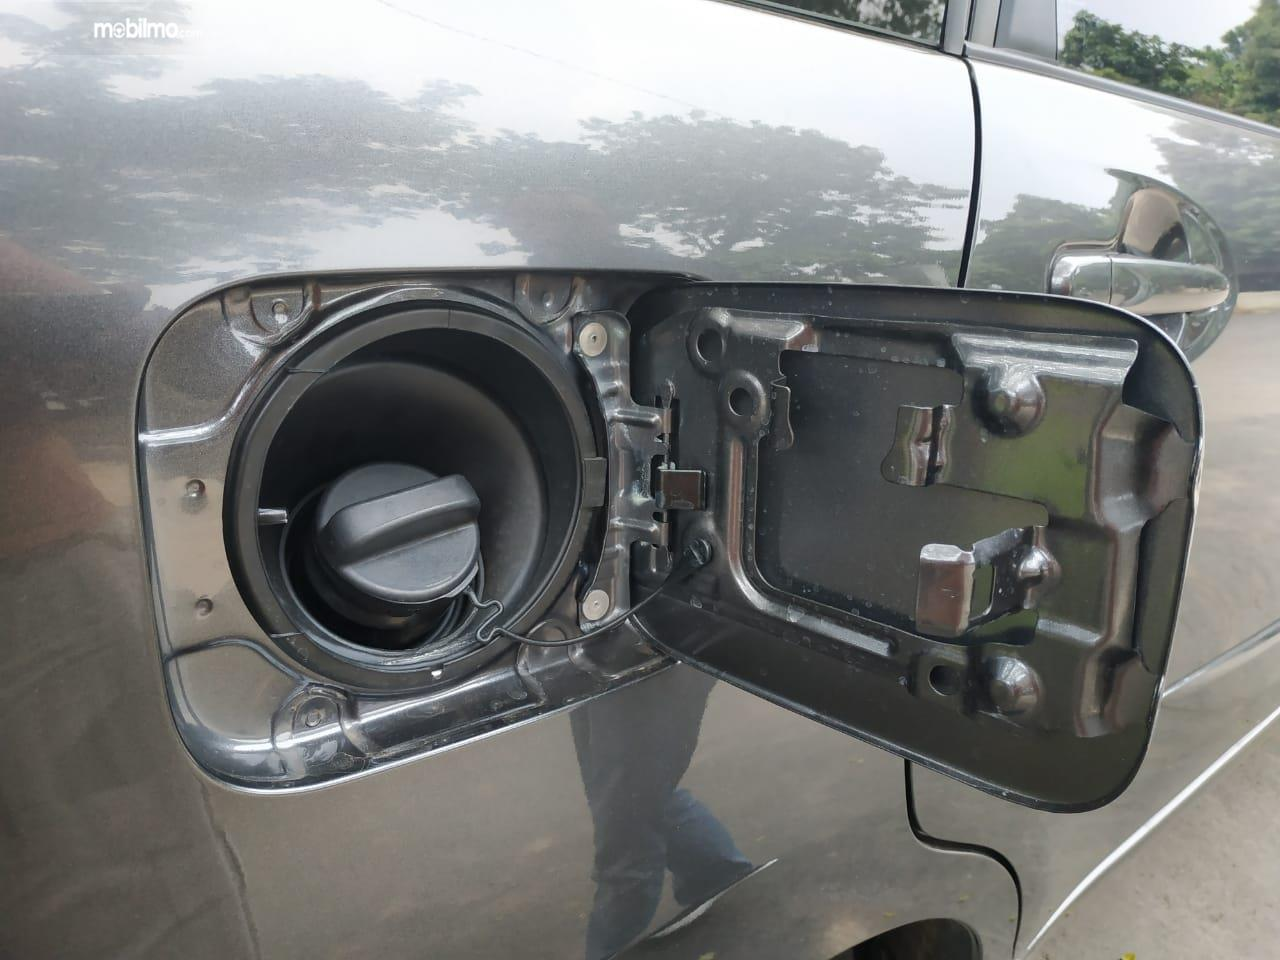 Tampak tutup tangki mobil Toyota Avanza